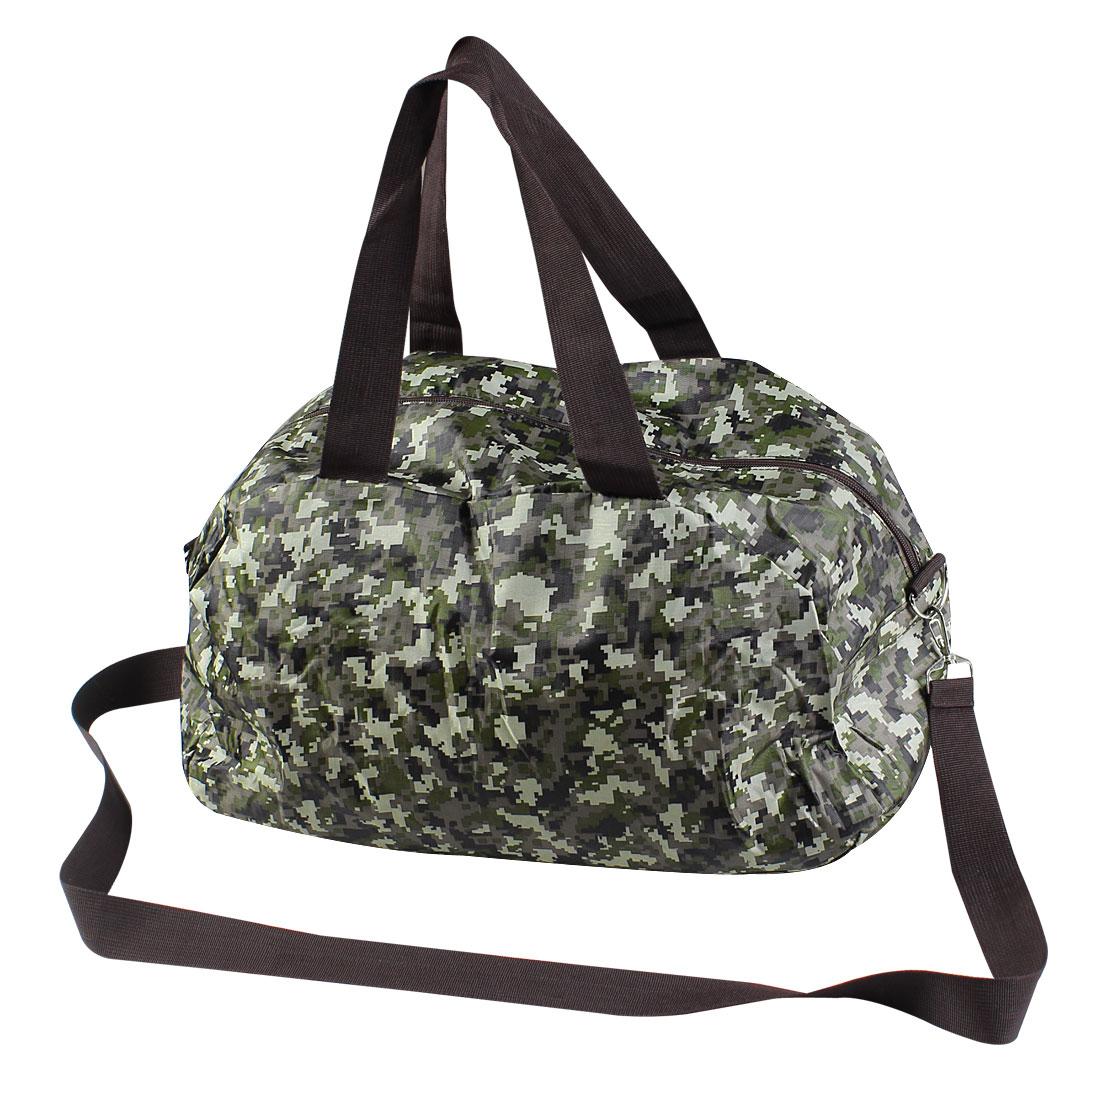 2 in 1 Camouflage Color Zipper Up Closure Handbag Purse for Men